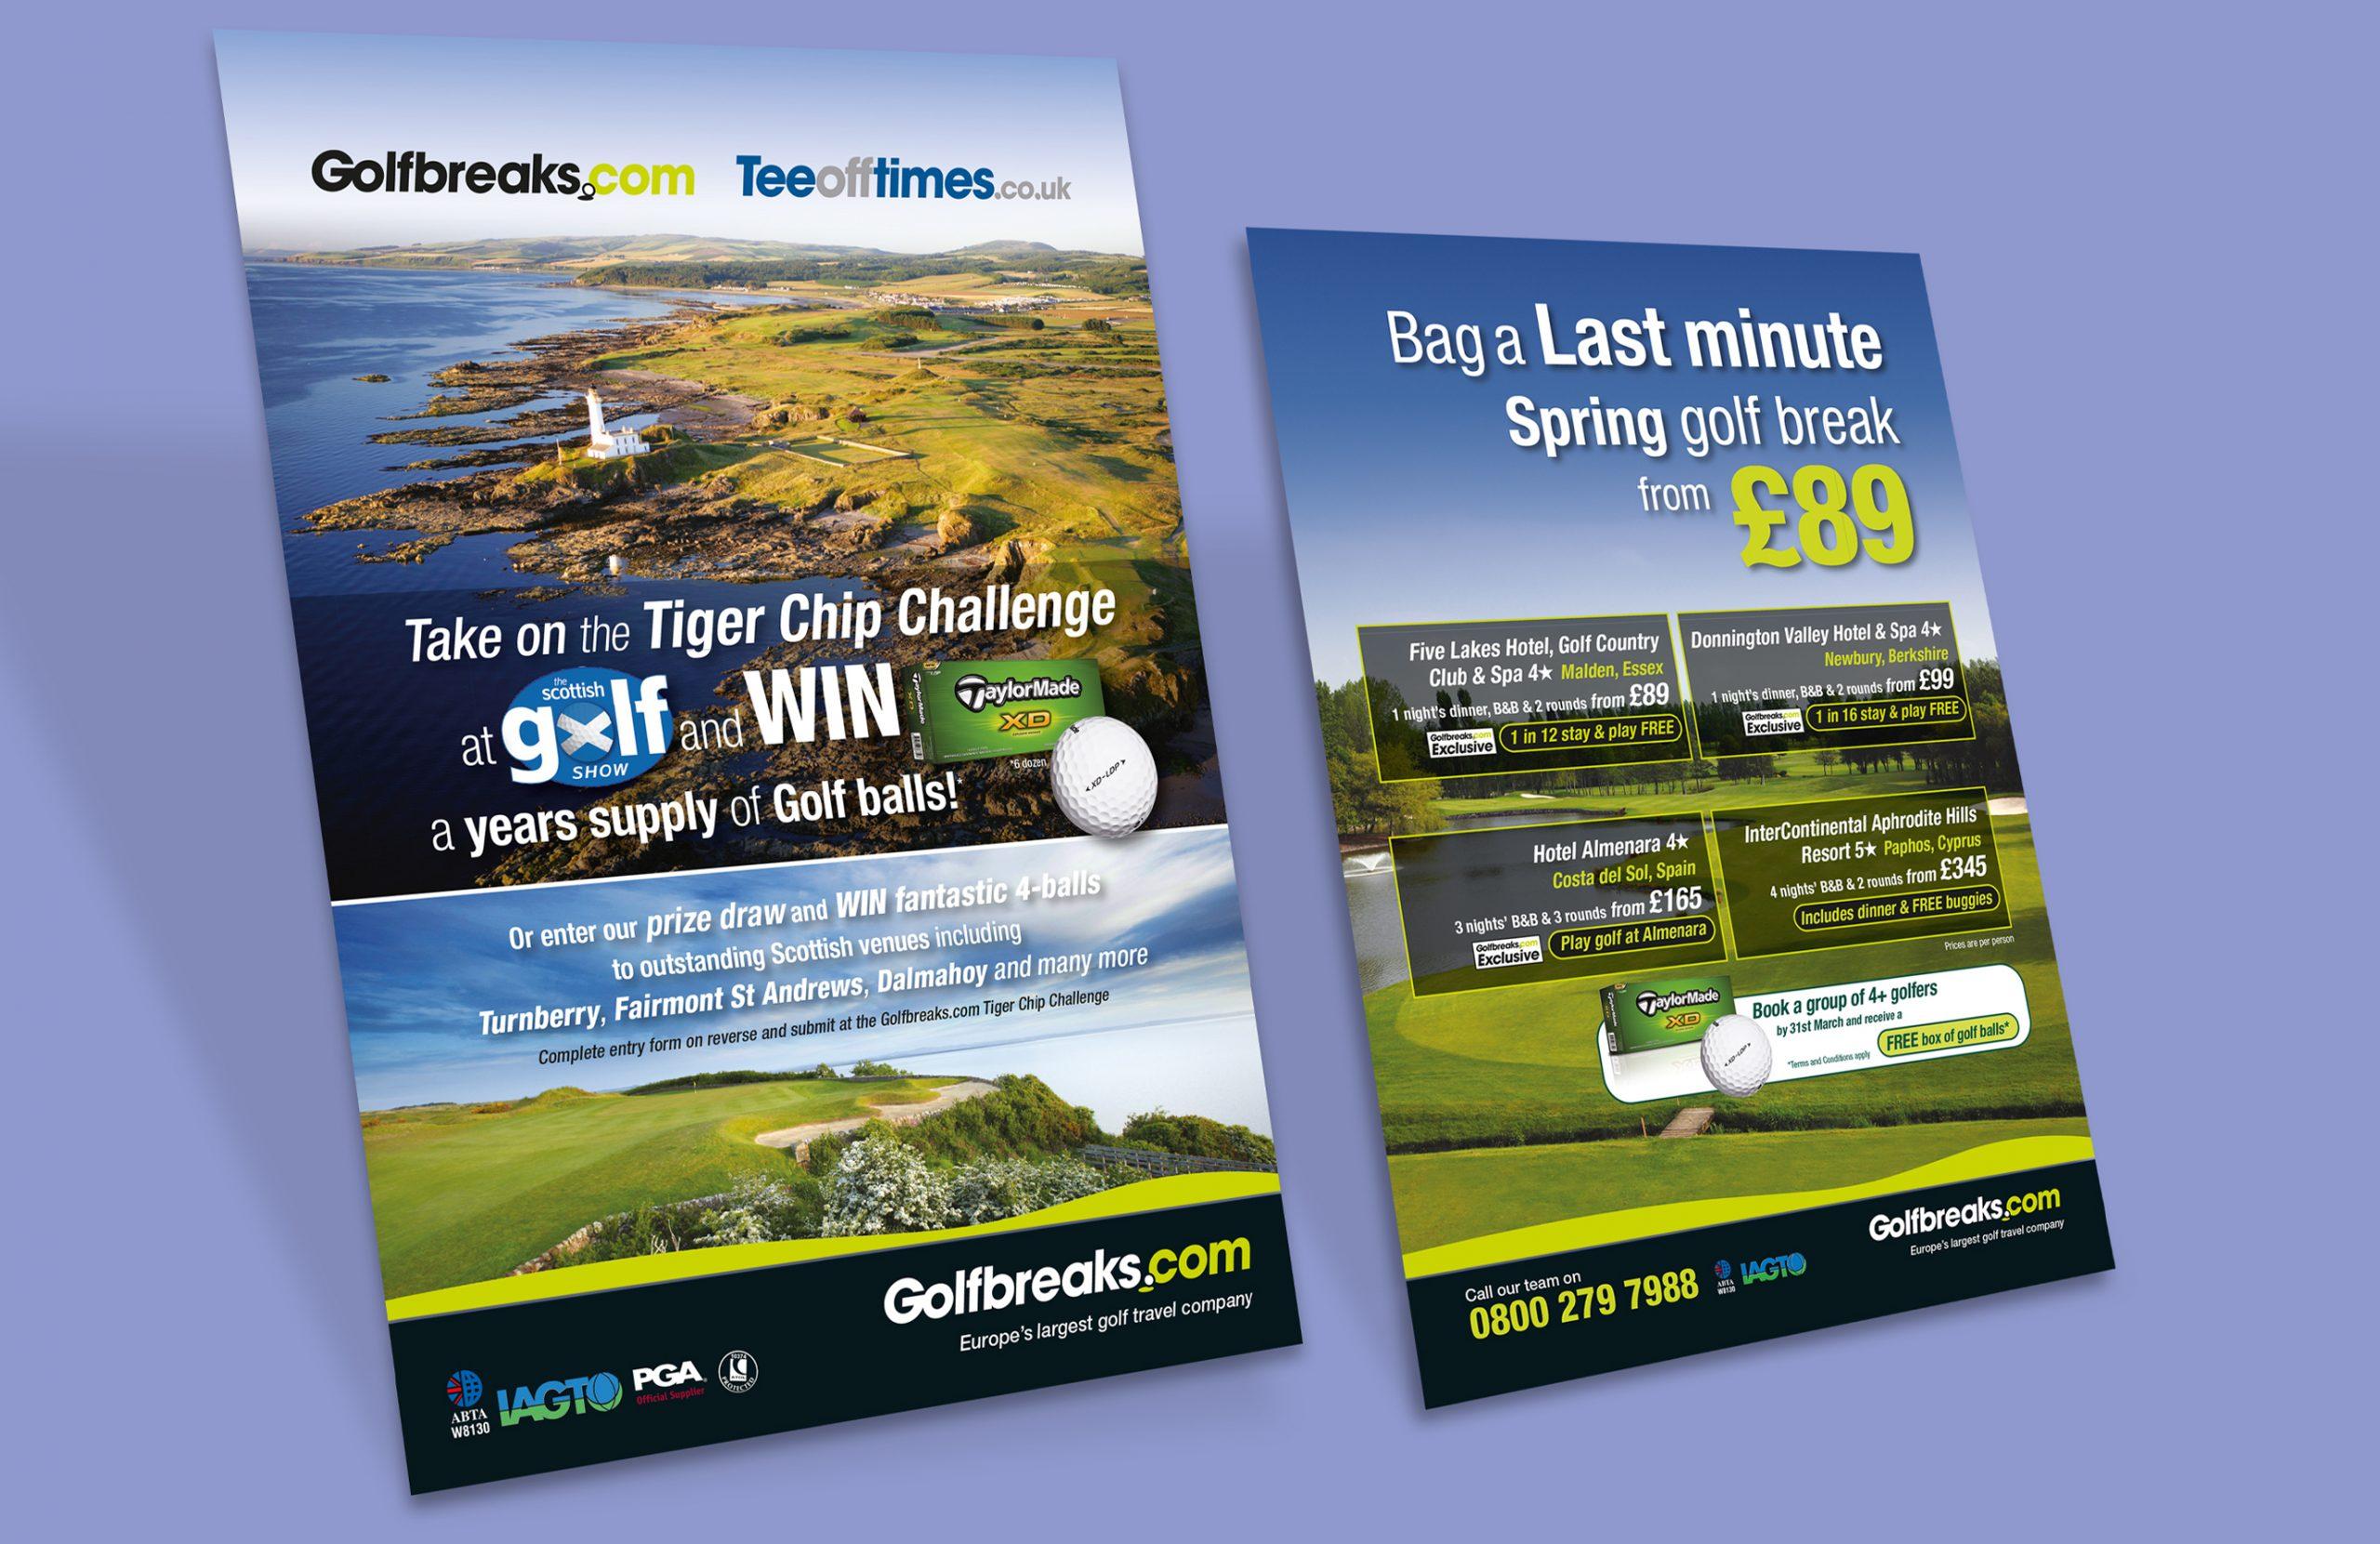 Golfbreaks.com creative